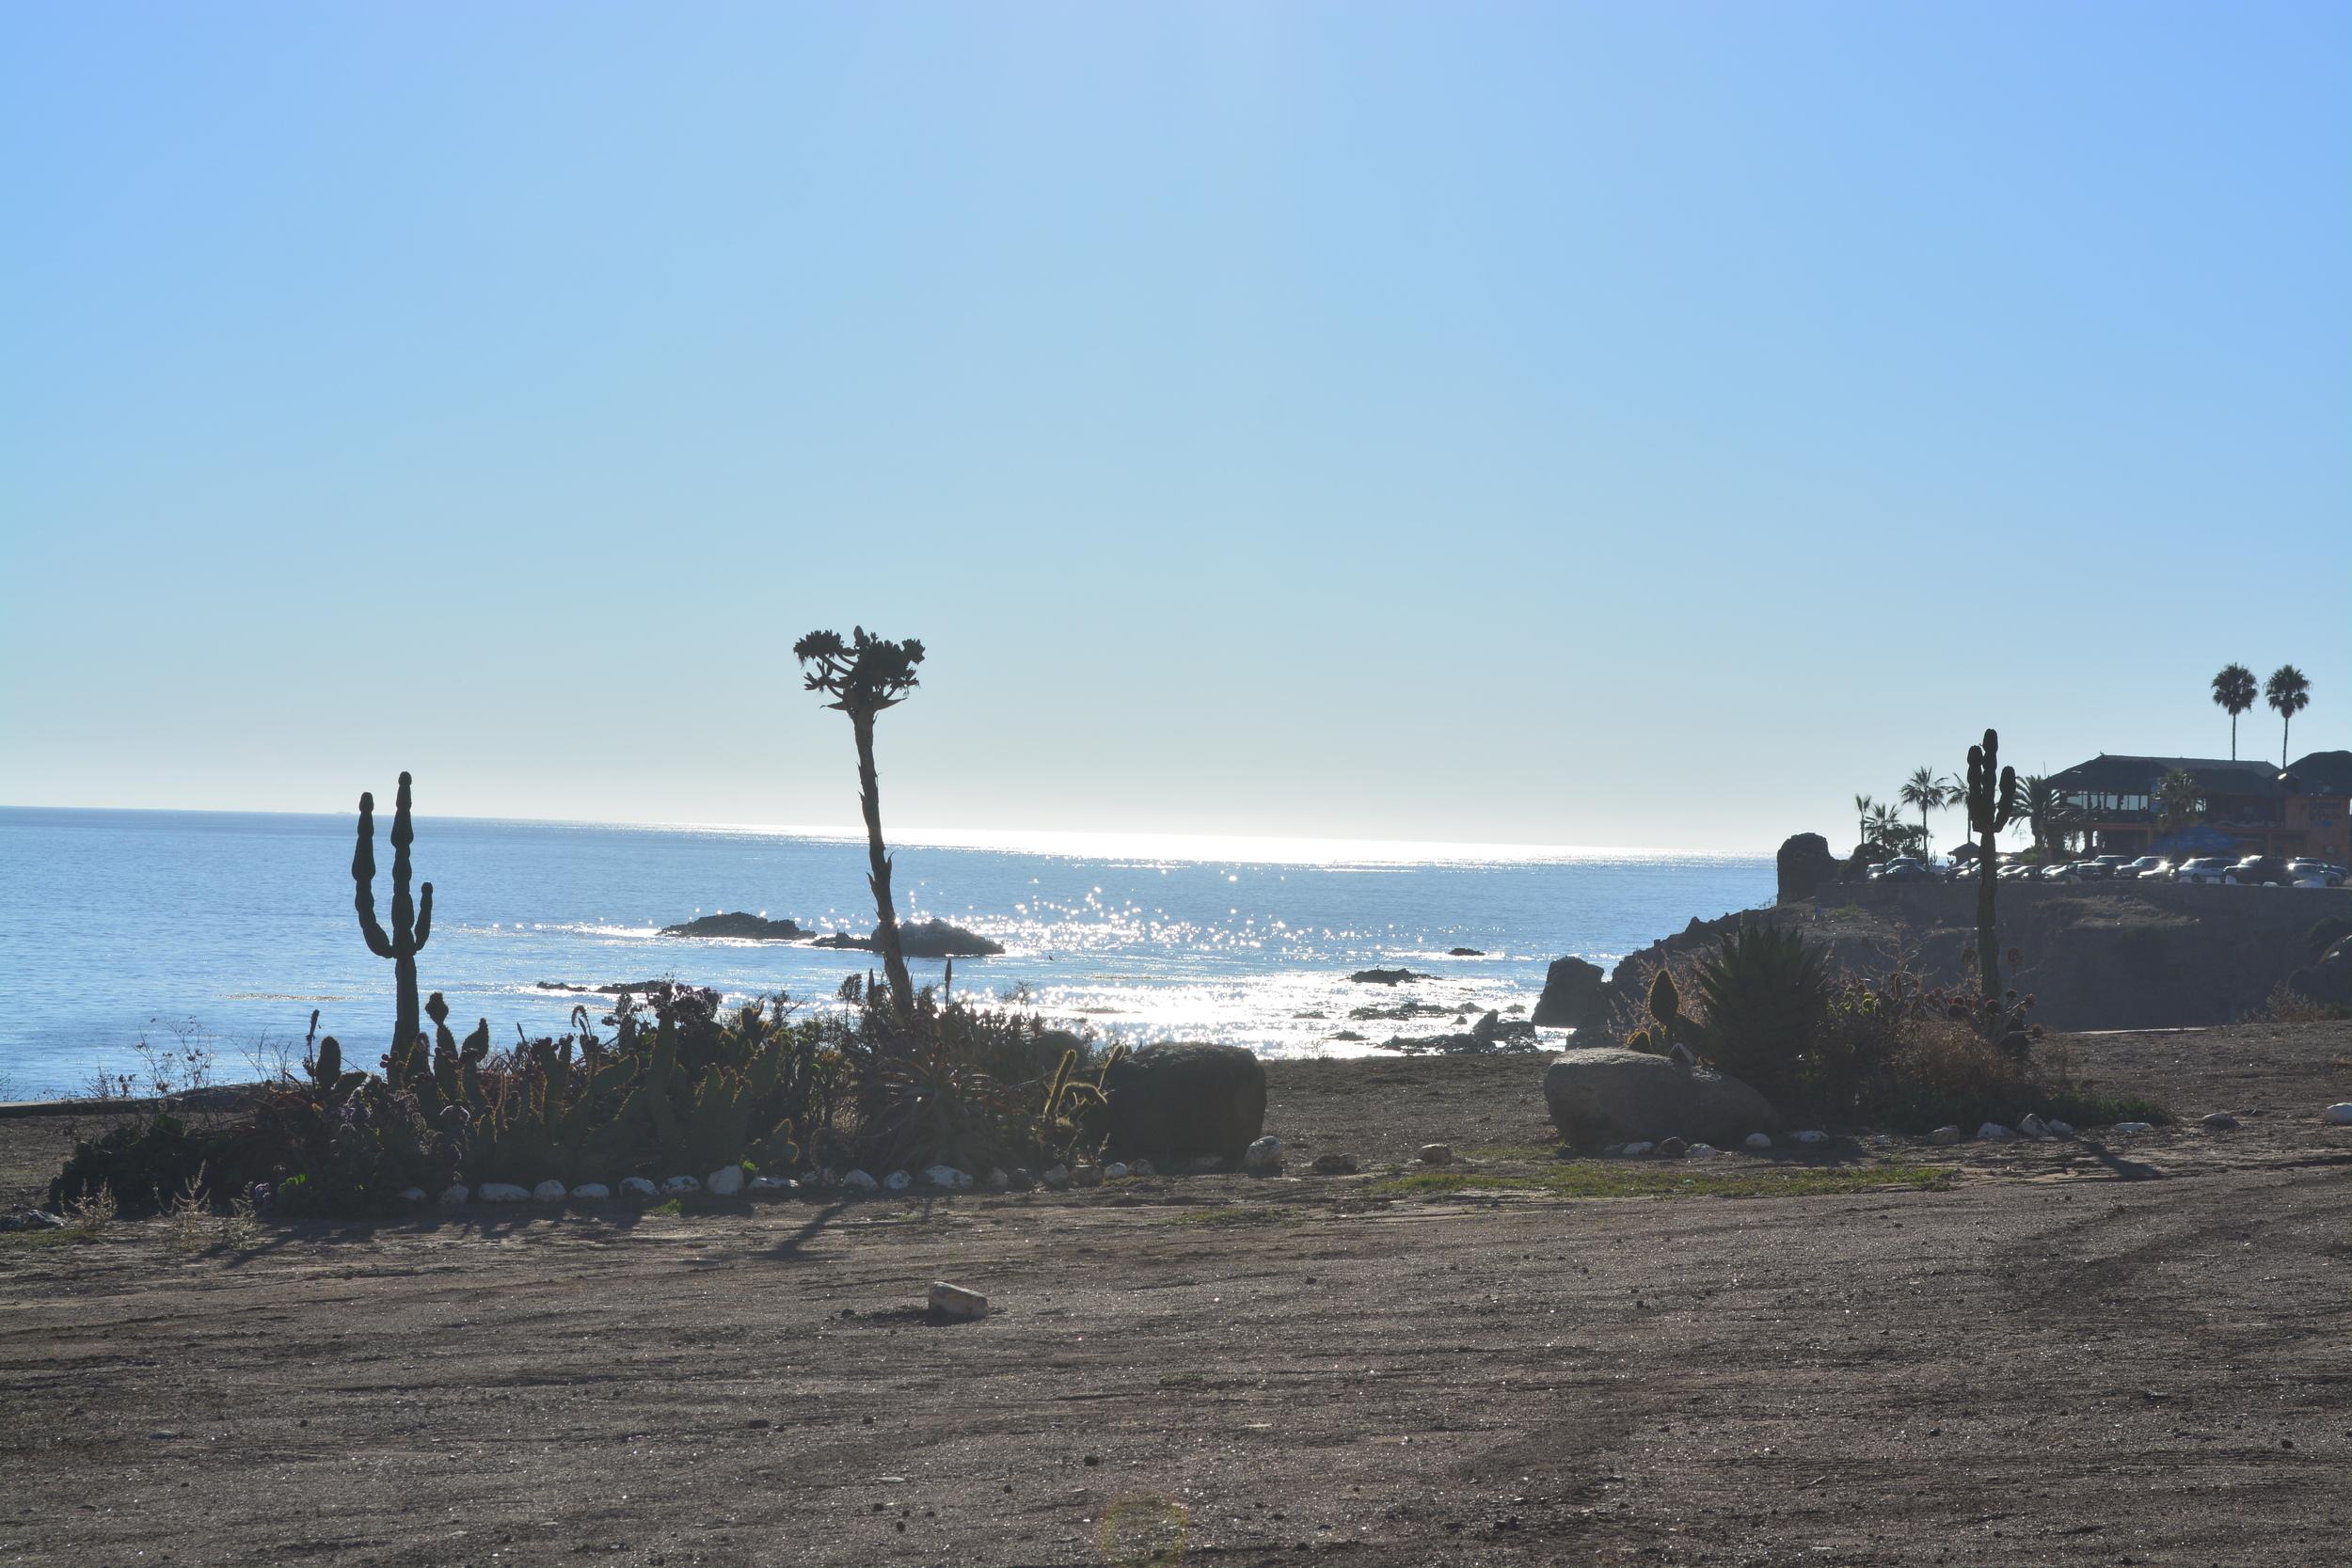 Ocean Experience Surf School Baja Mexico Surfing Adventure (5).JPG